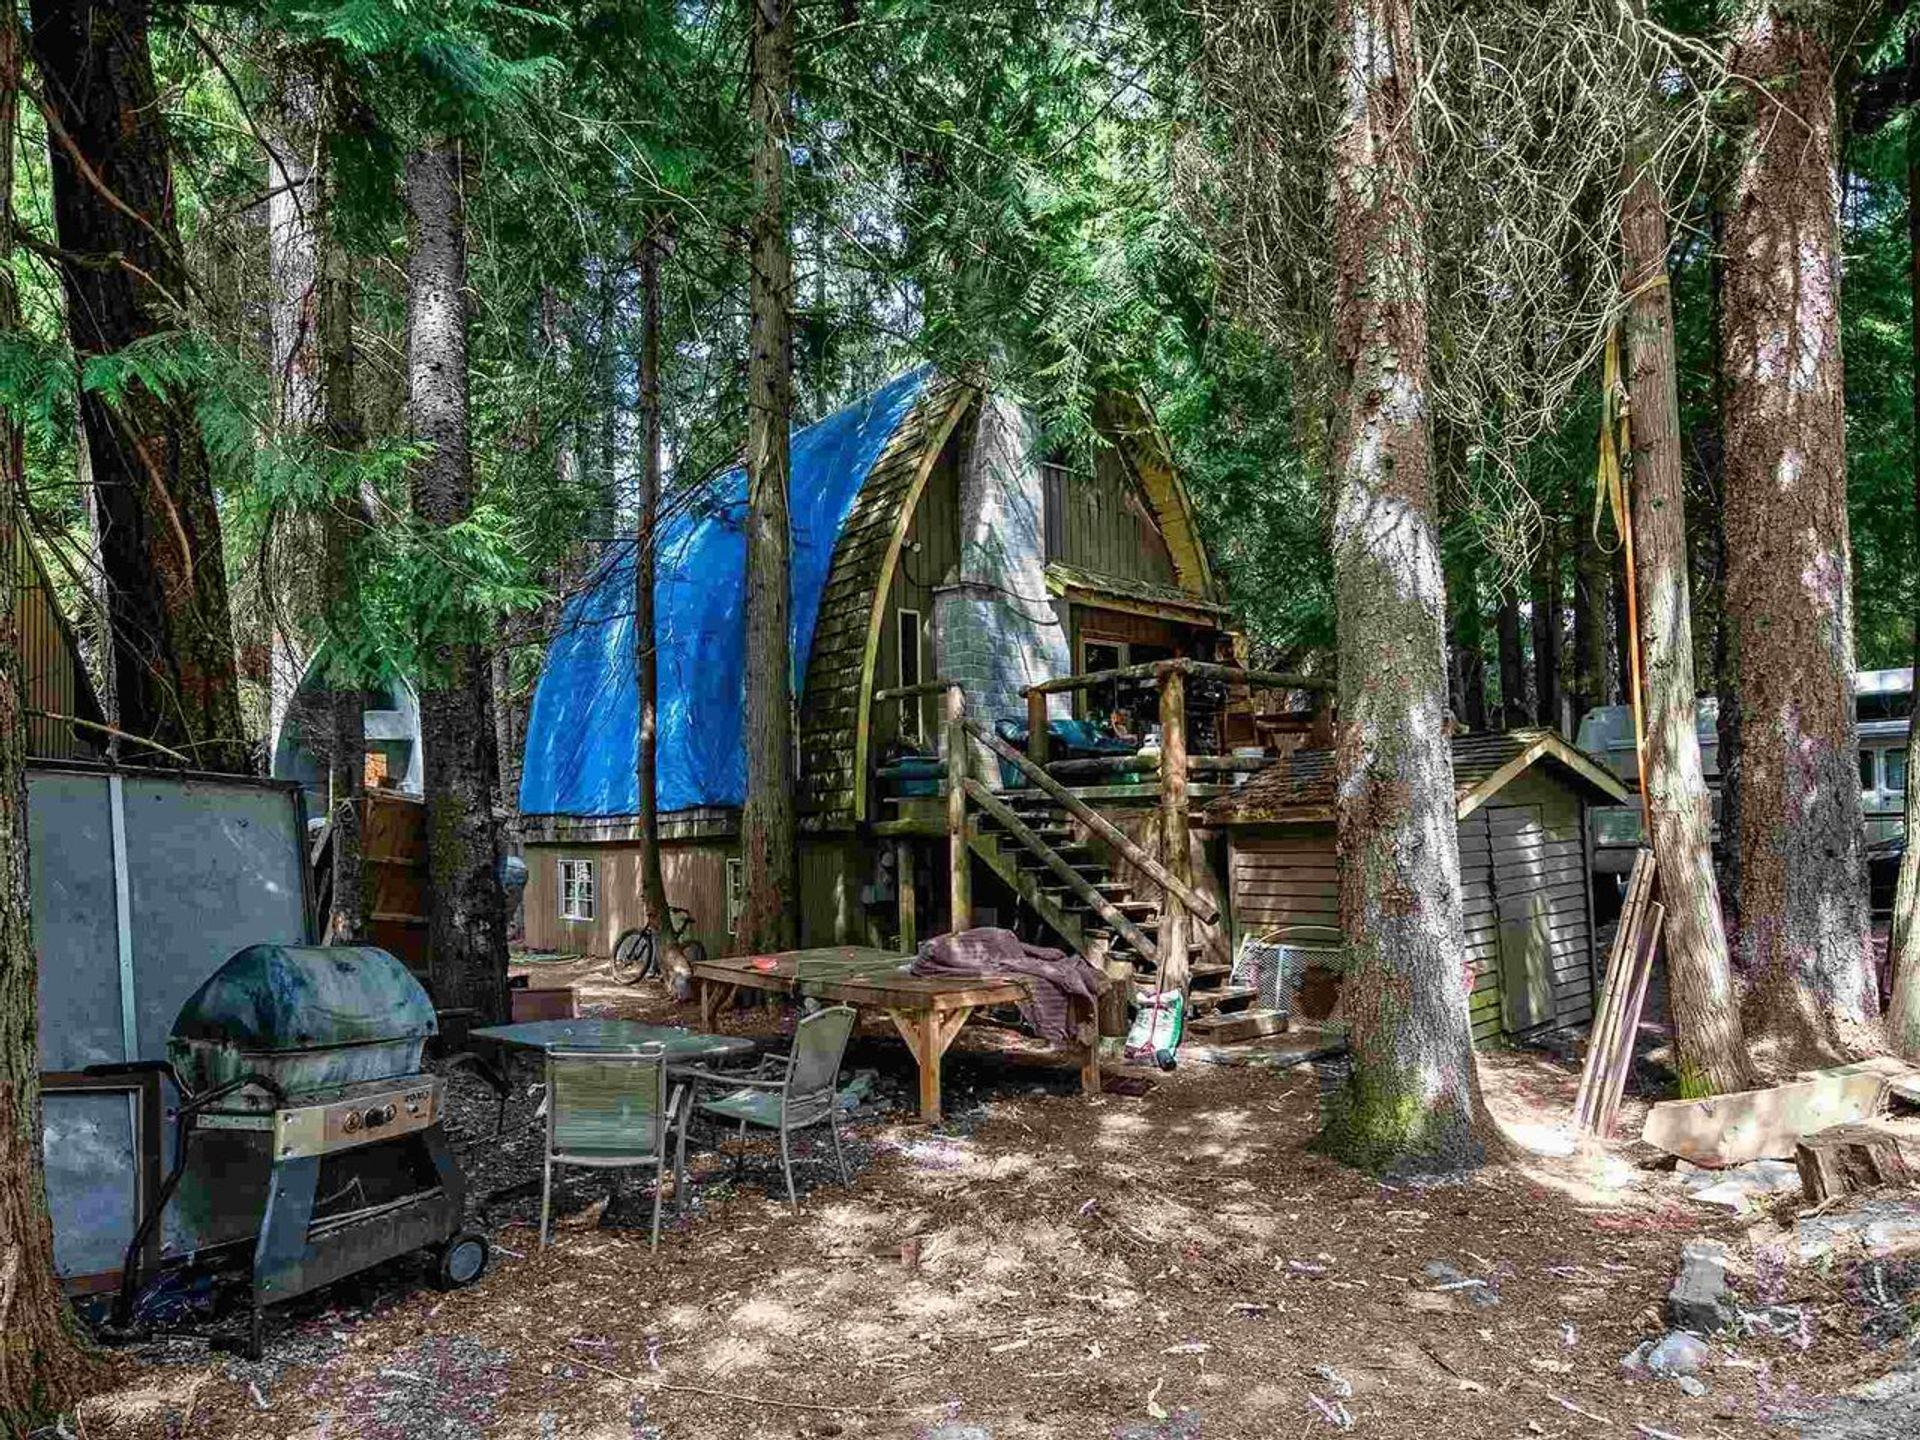 6517-balsam-way-whistler-cay-estates-whistler-09 at 6517 Balsam Way, Whistler Cay Estates, Whistler